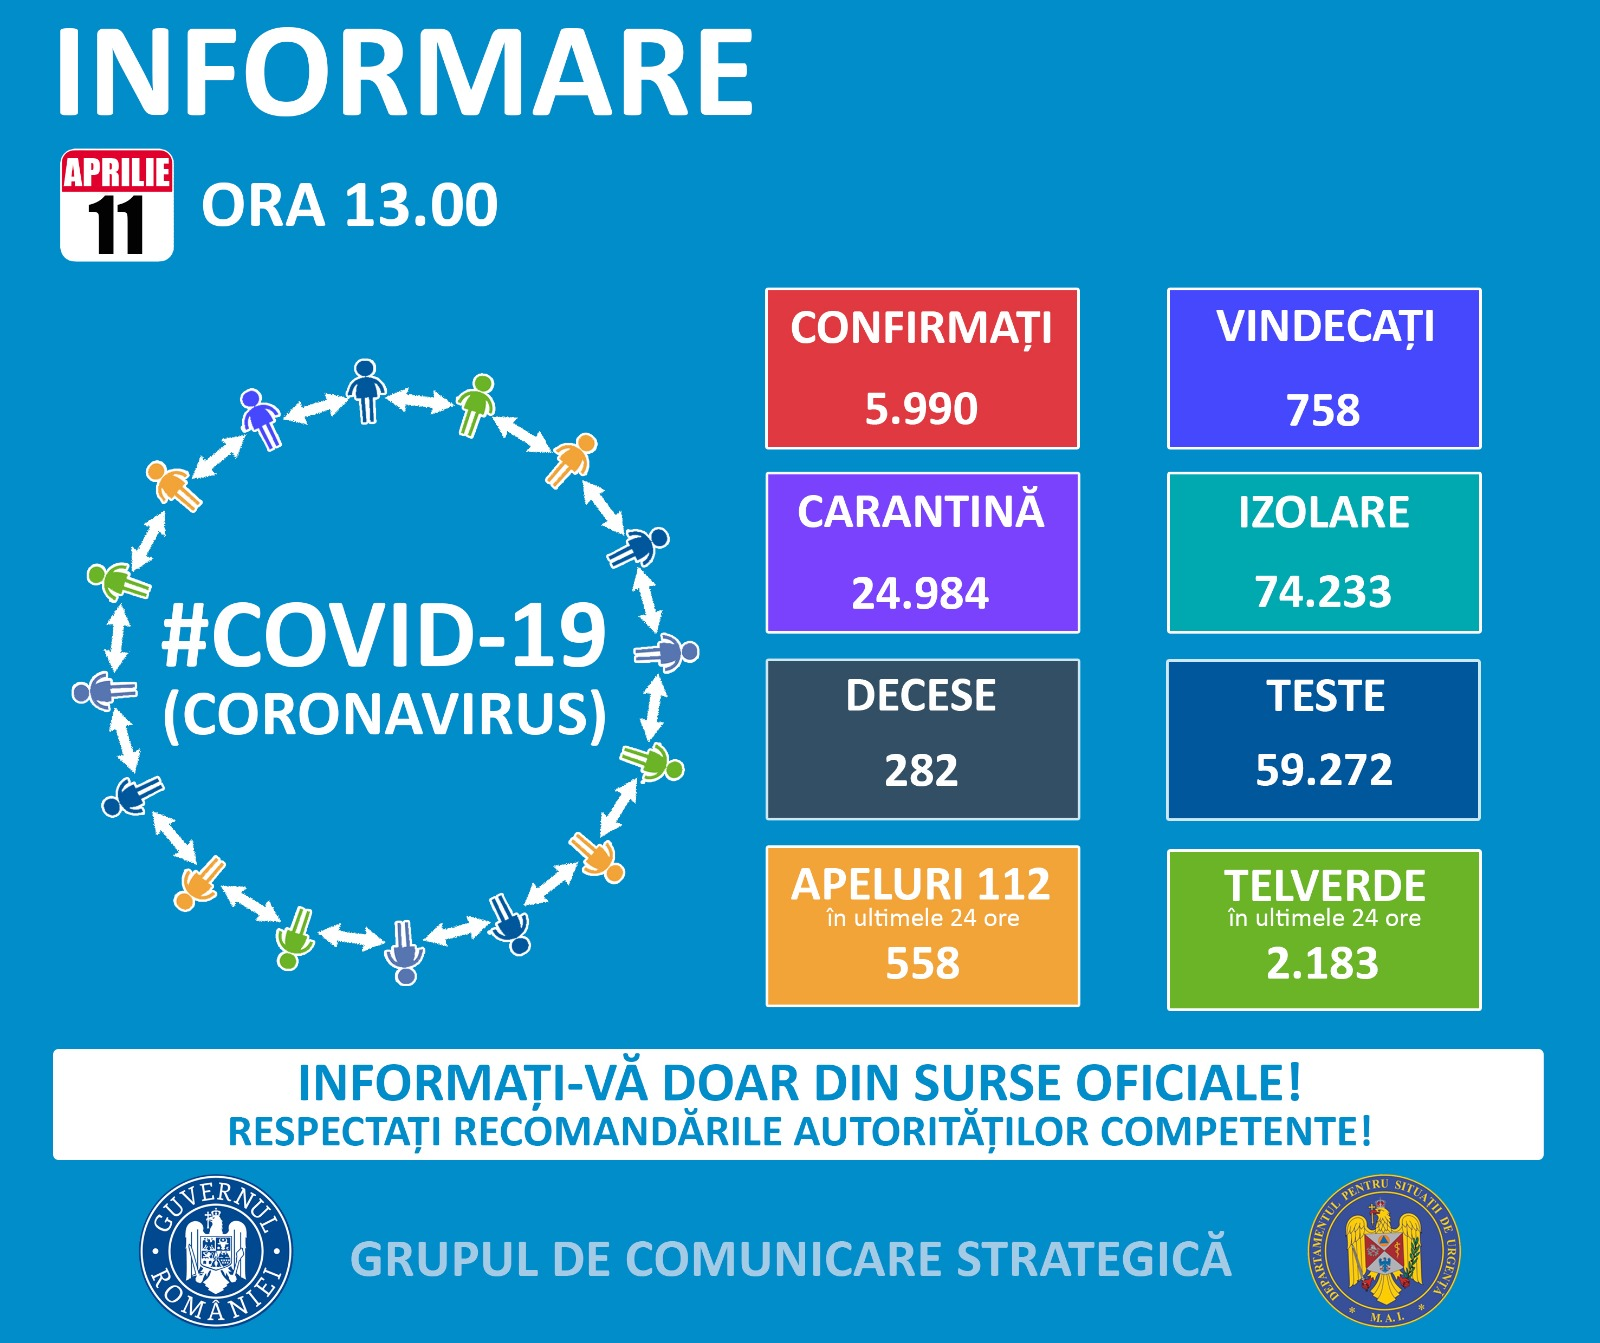 Coronavirus Romania situatie 11 aprilie 2020